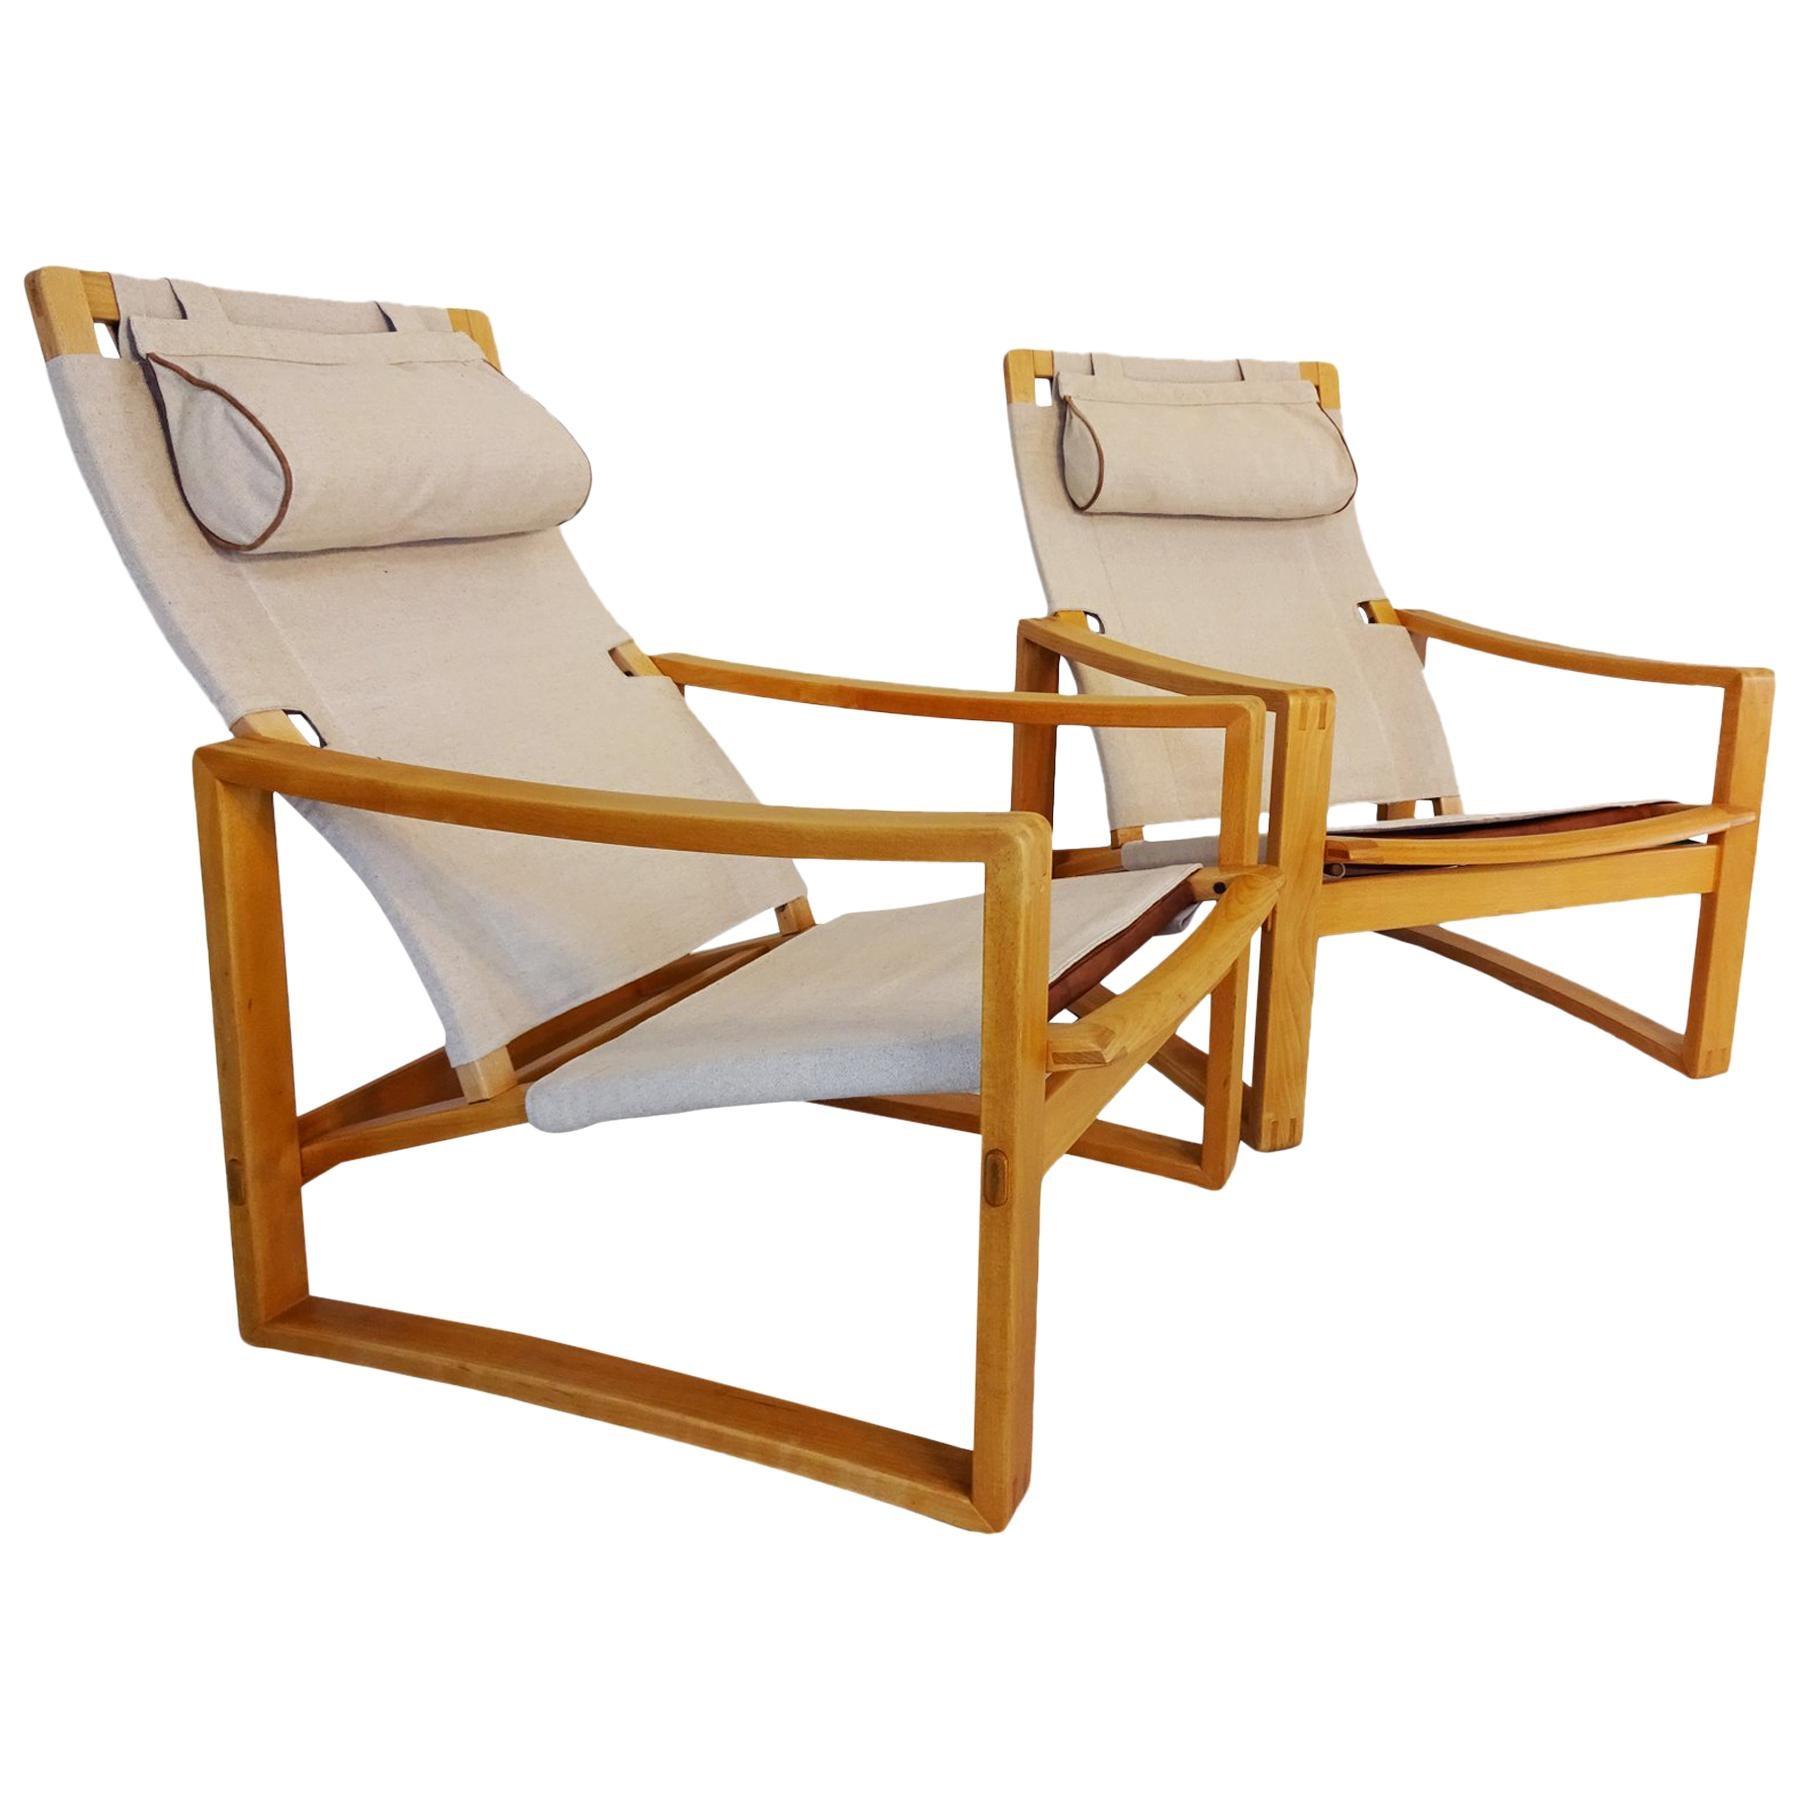 Lounge Chairs -  Safari style Danish Midcentury chairs by Børge Jensen & Sønner